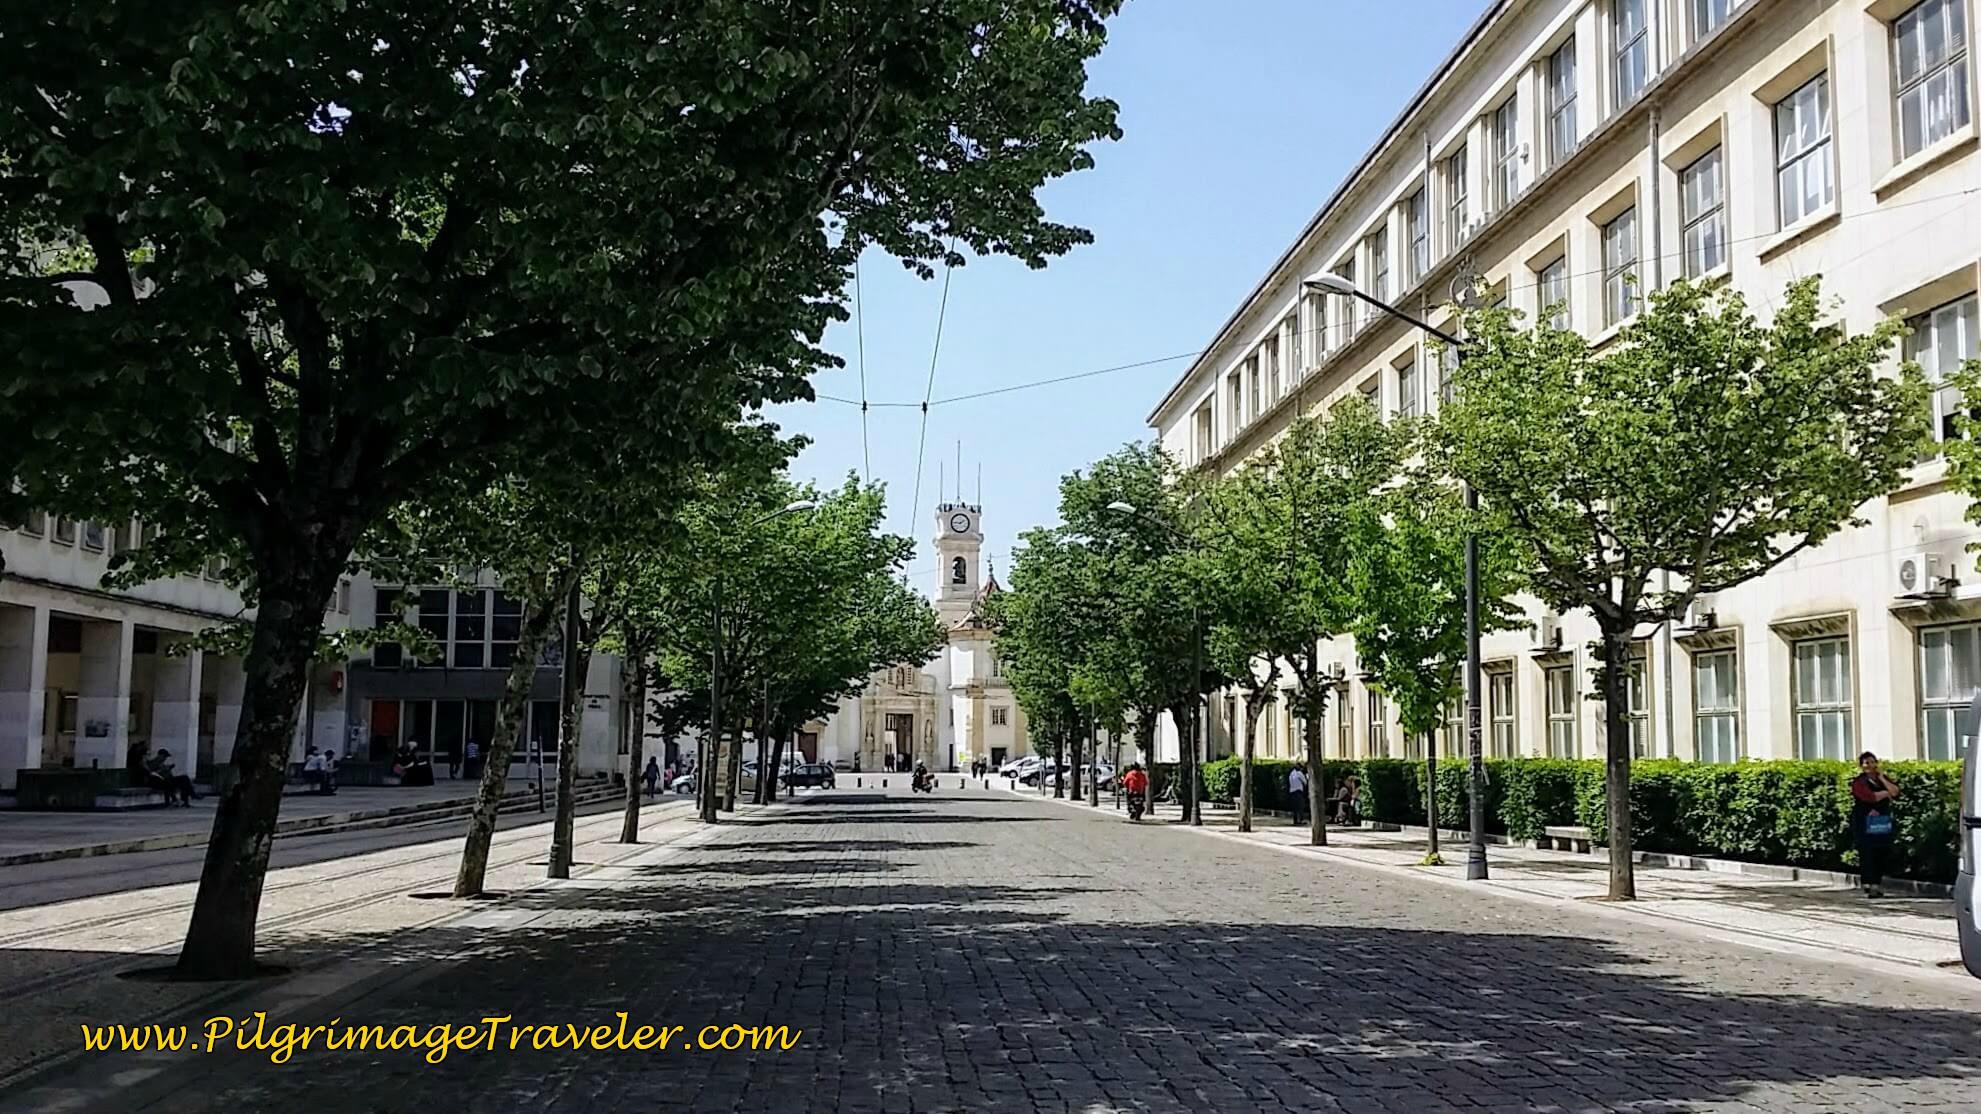 Largo Porta Férrea, University of Coimbra